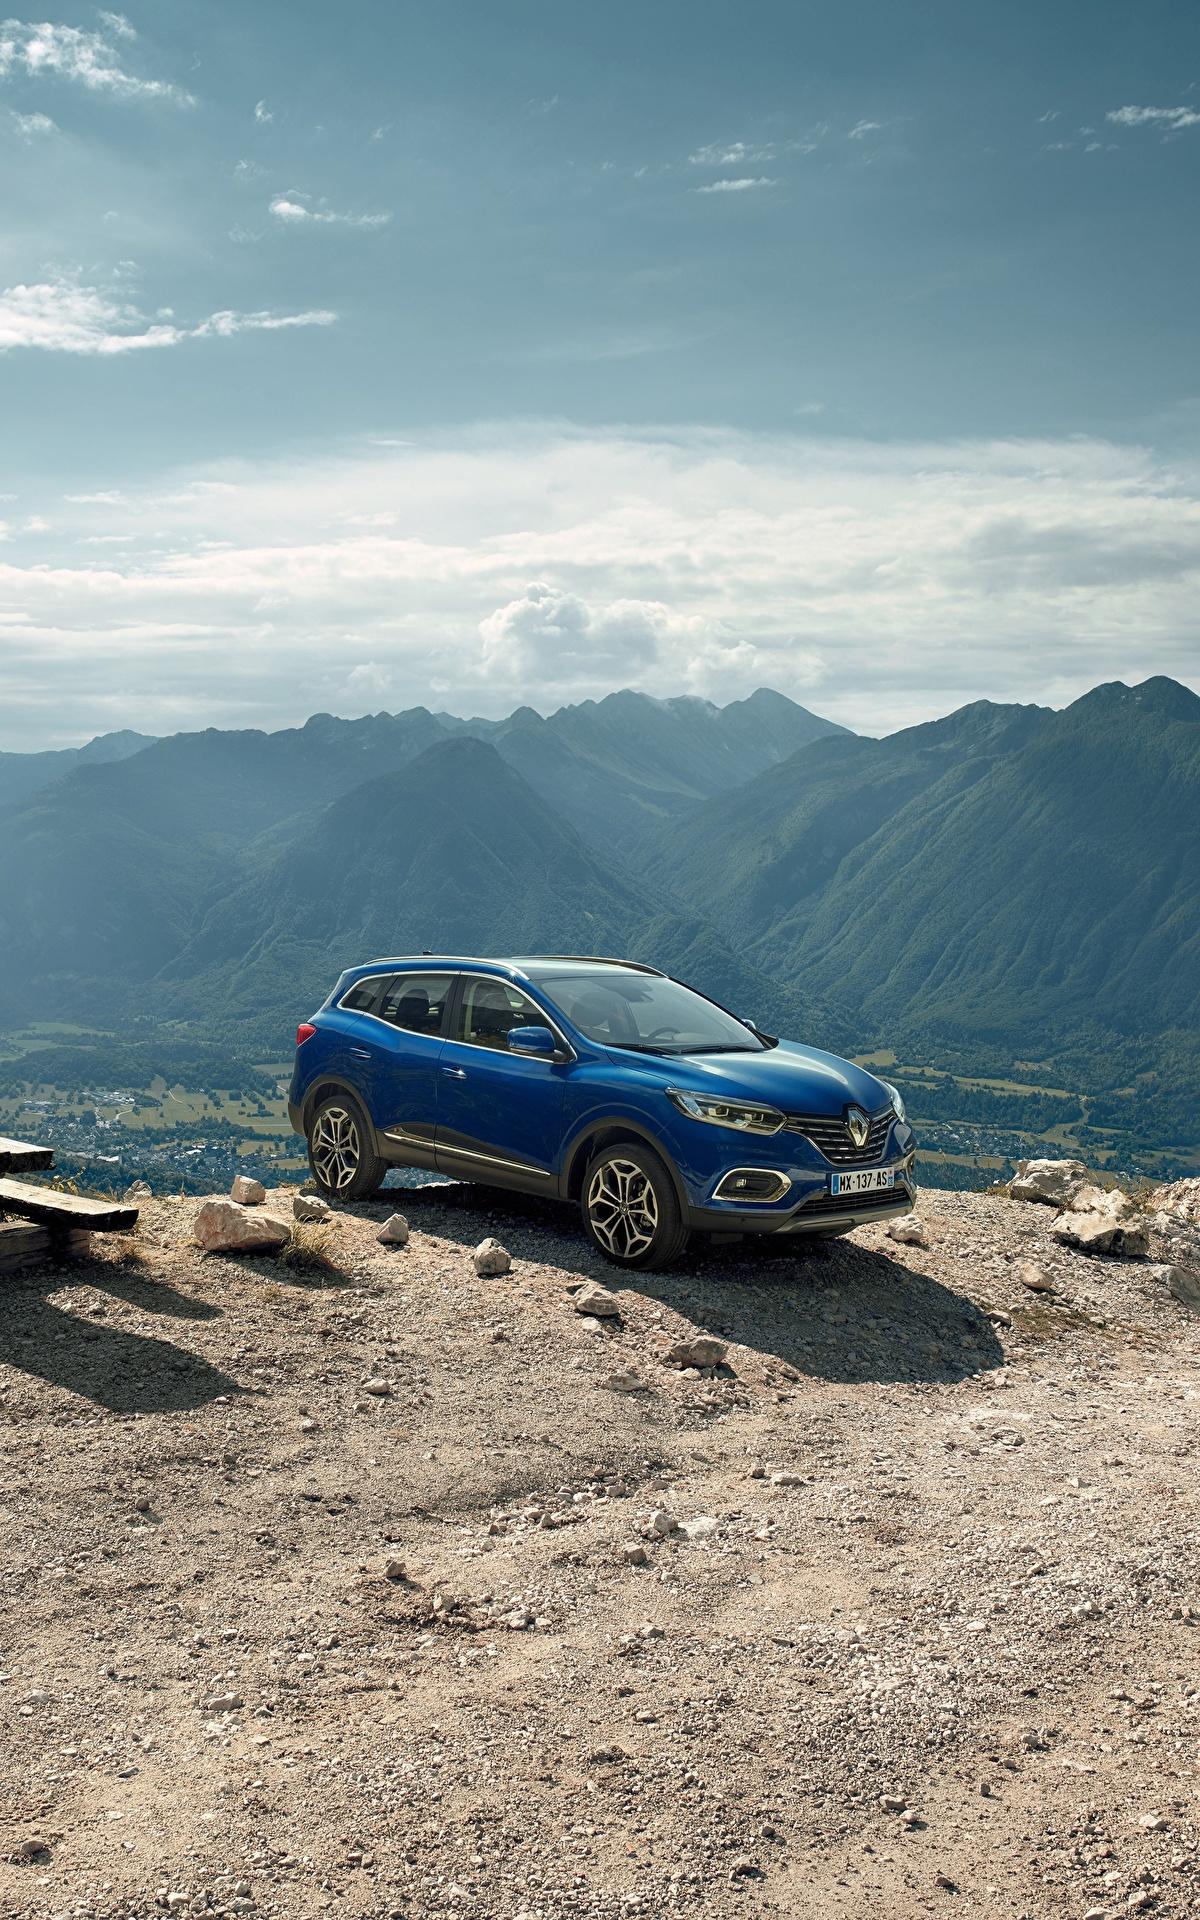 Картинка Рено 2018 Kadjar Worldwide Синий Автомобили 1200x1920 Renault Авто Машины